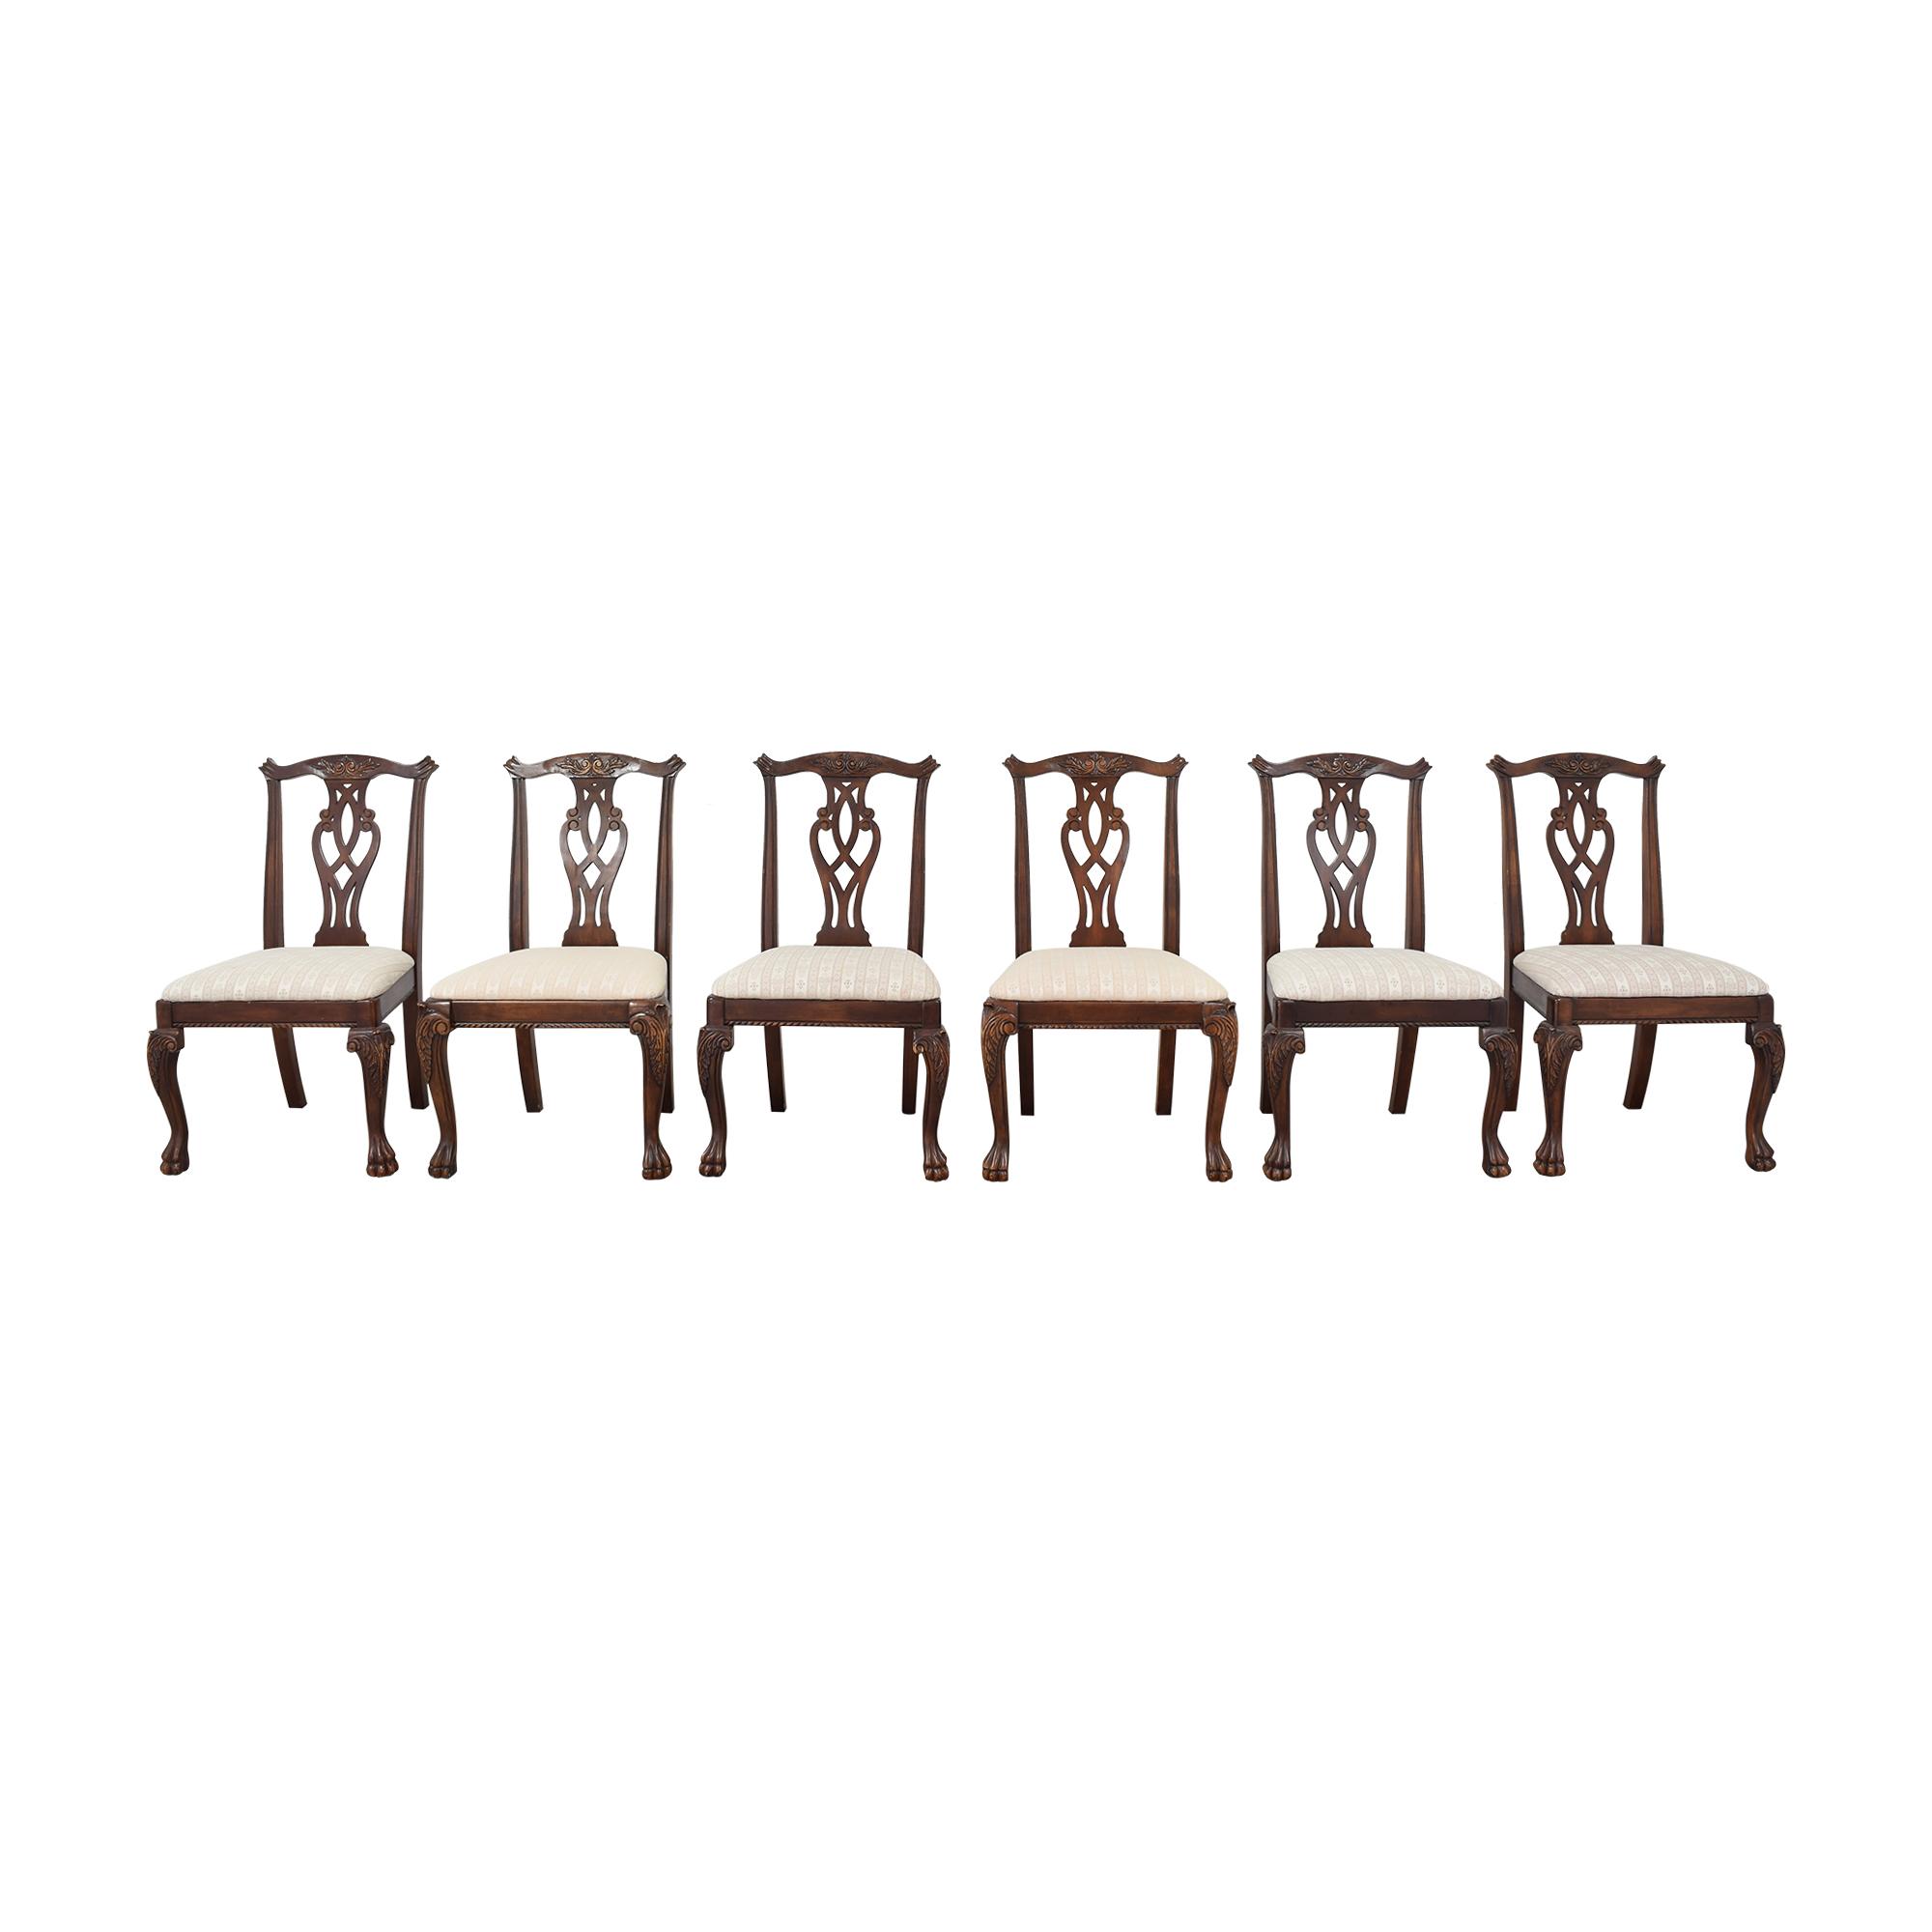 buy Regency Regency House Dining Side Chairs online